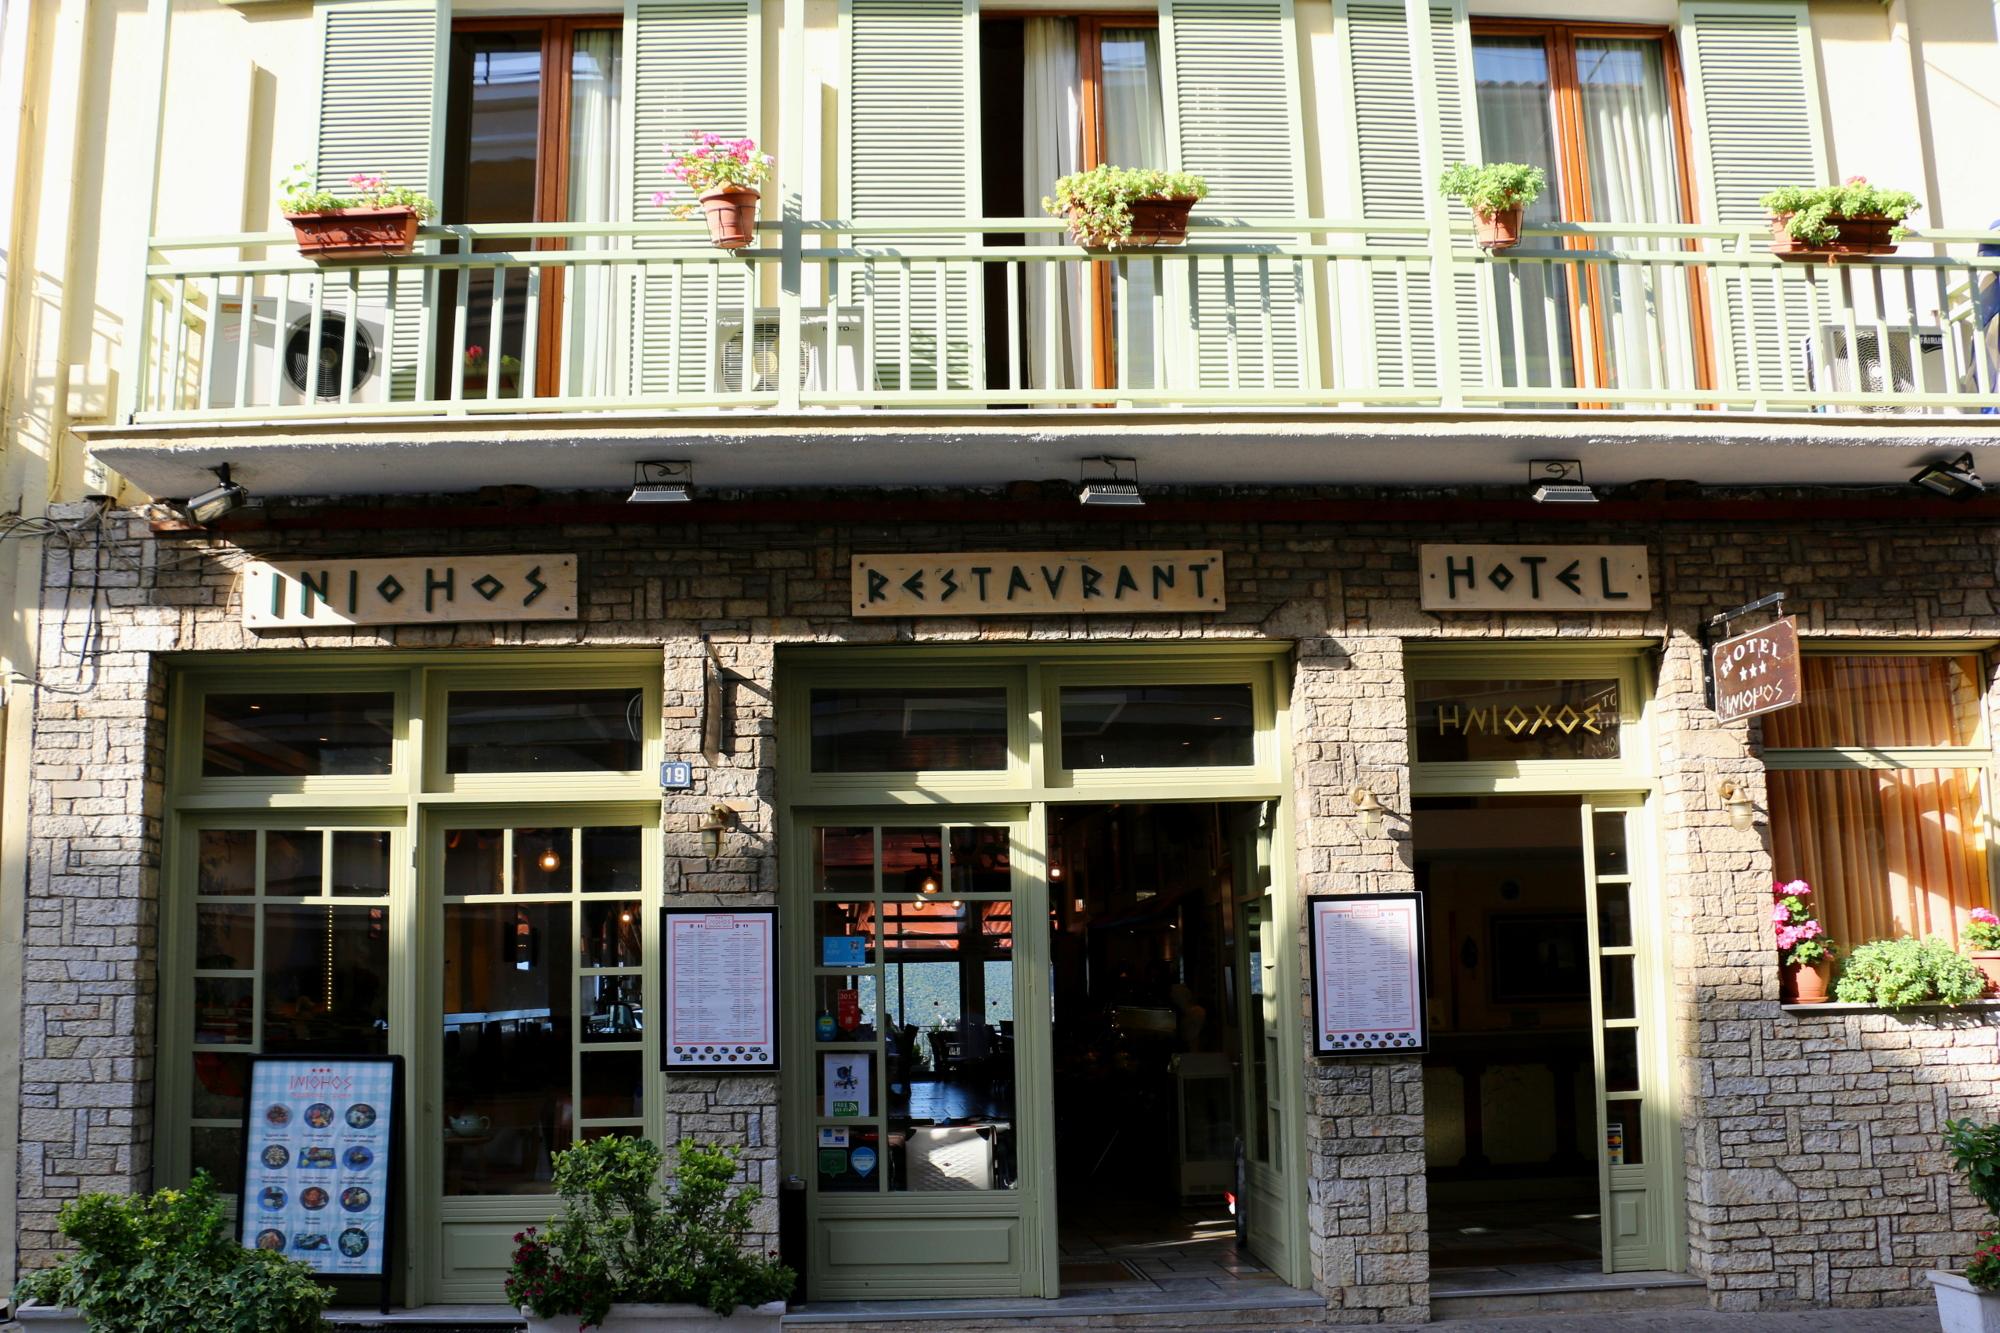 Hotel Iniohos - Delfy